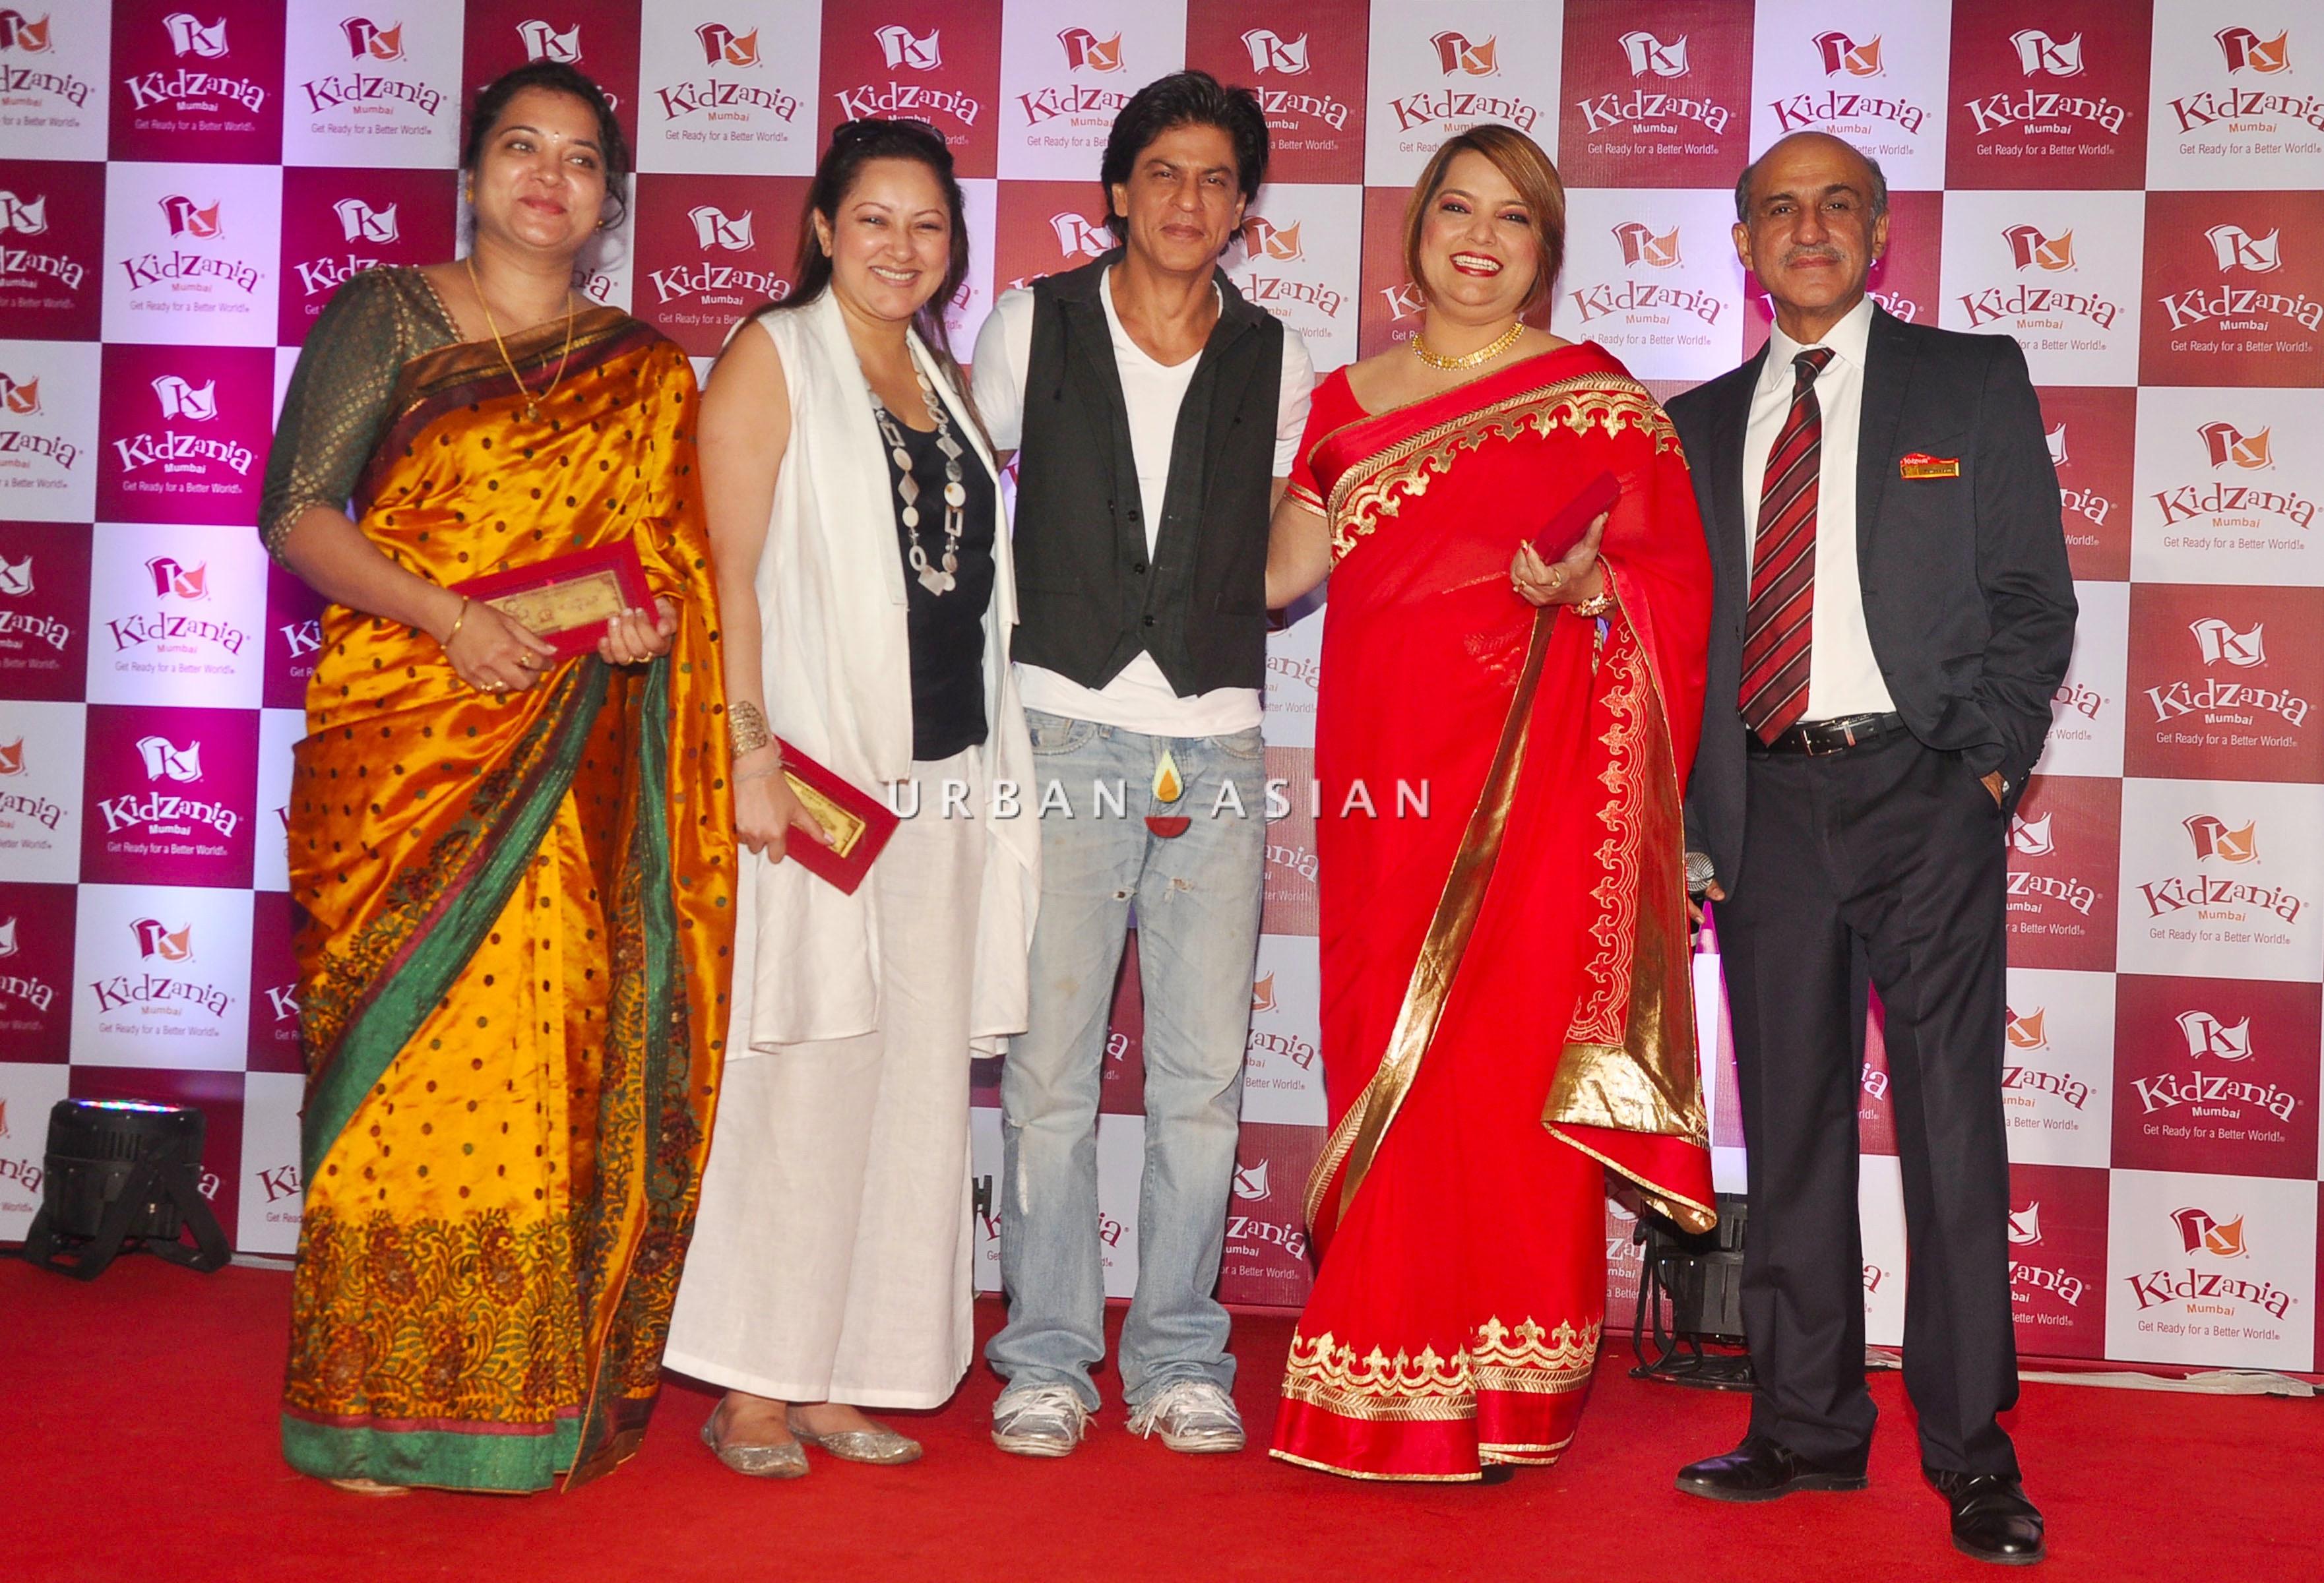 JYOTI NAIR, LINA ASHAR, SRK, VANDANA LULLA AND SANJEEV KUMAR AT KIDZANIA DSC_6111